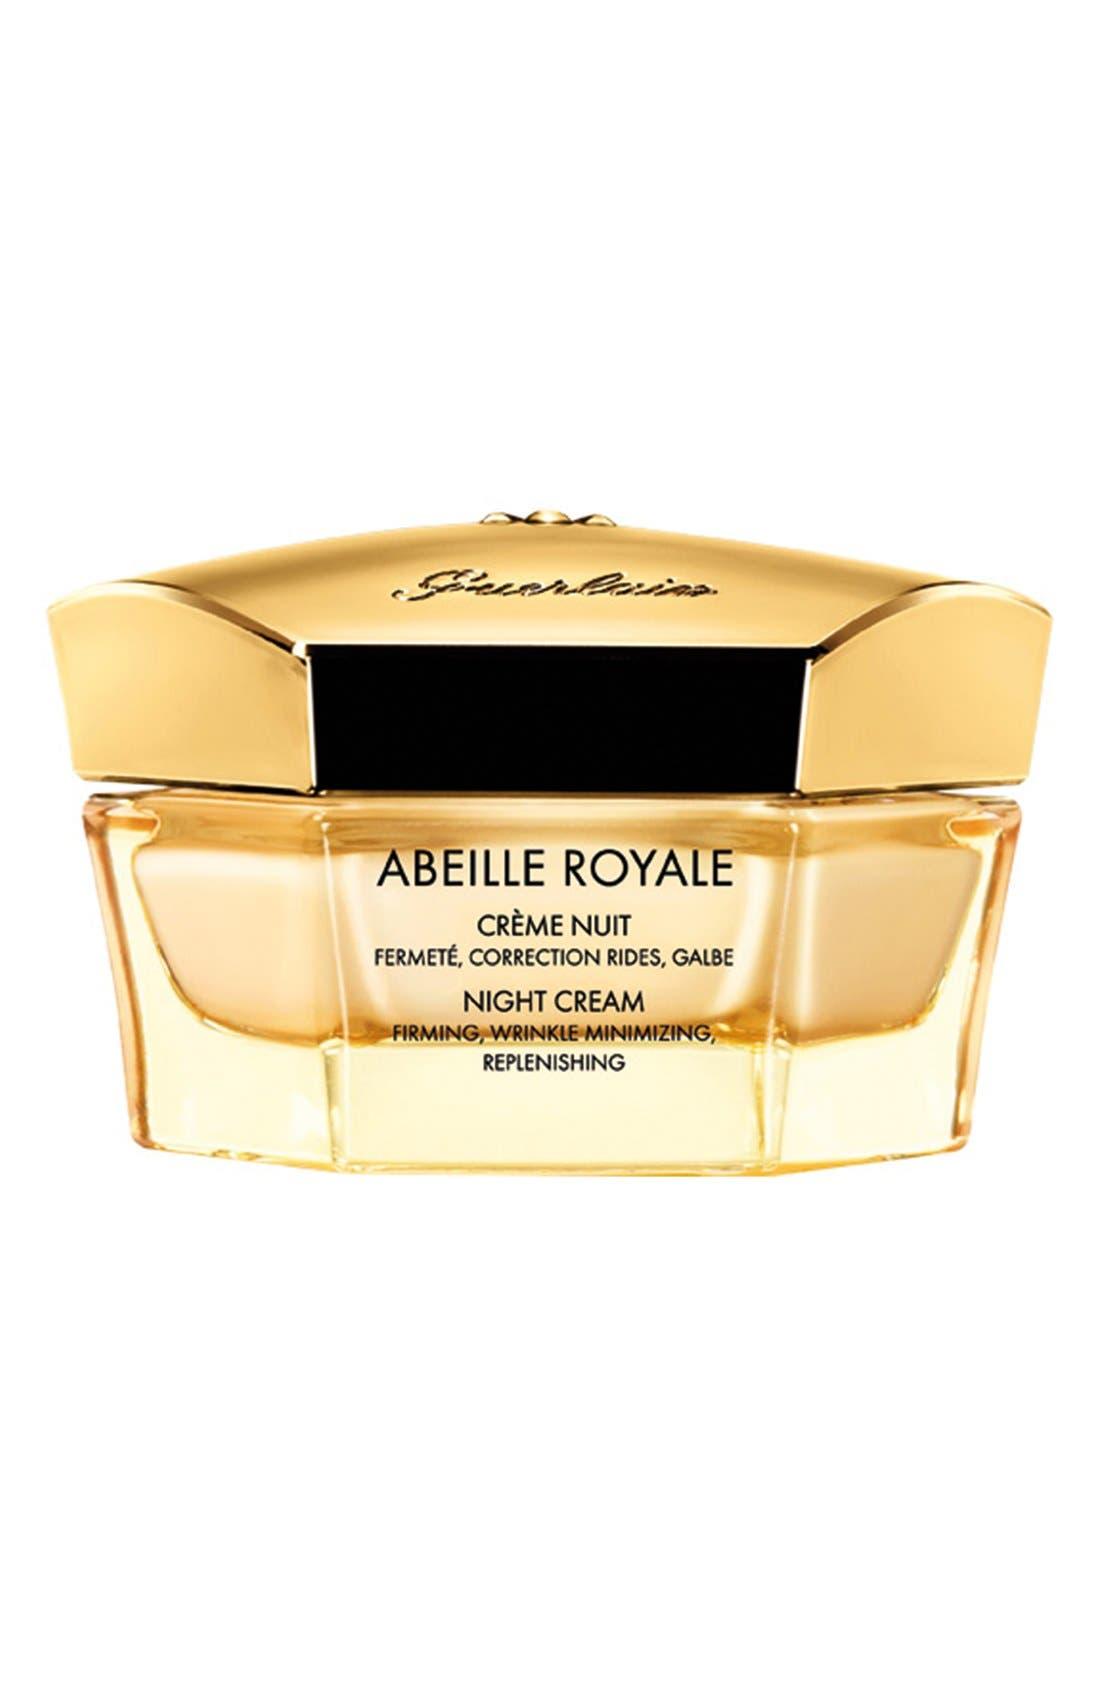 Guerlain 'Abeille Royale' Night Cream